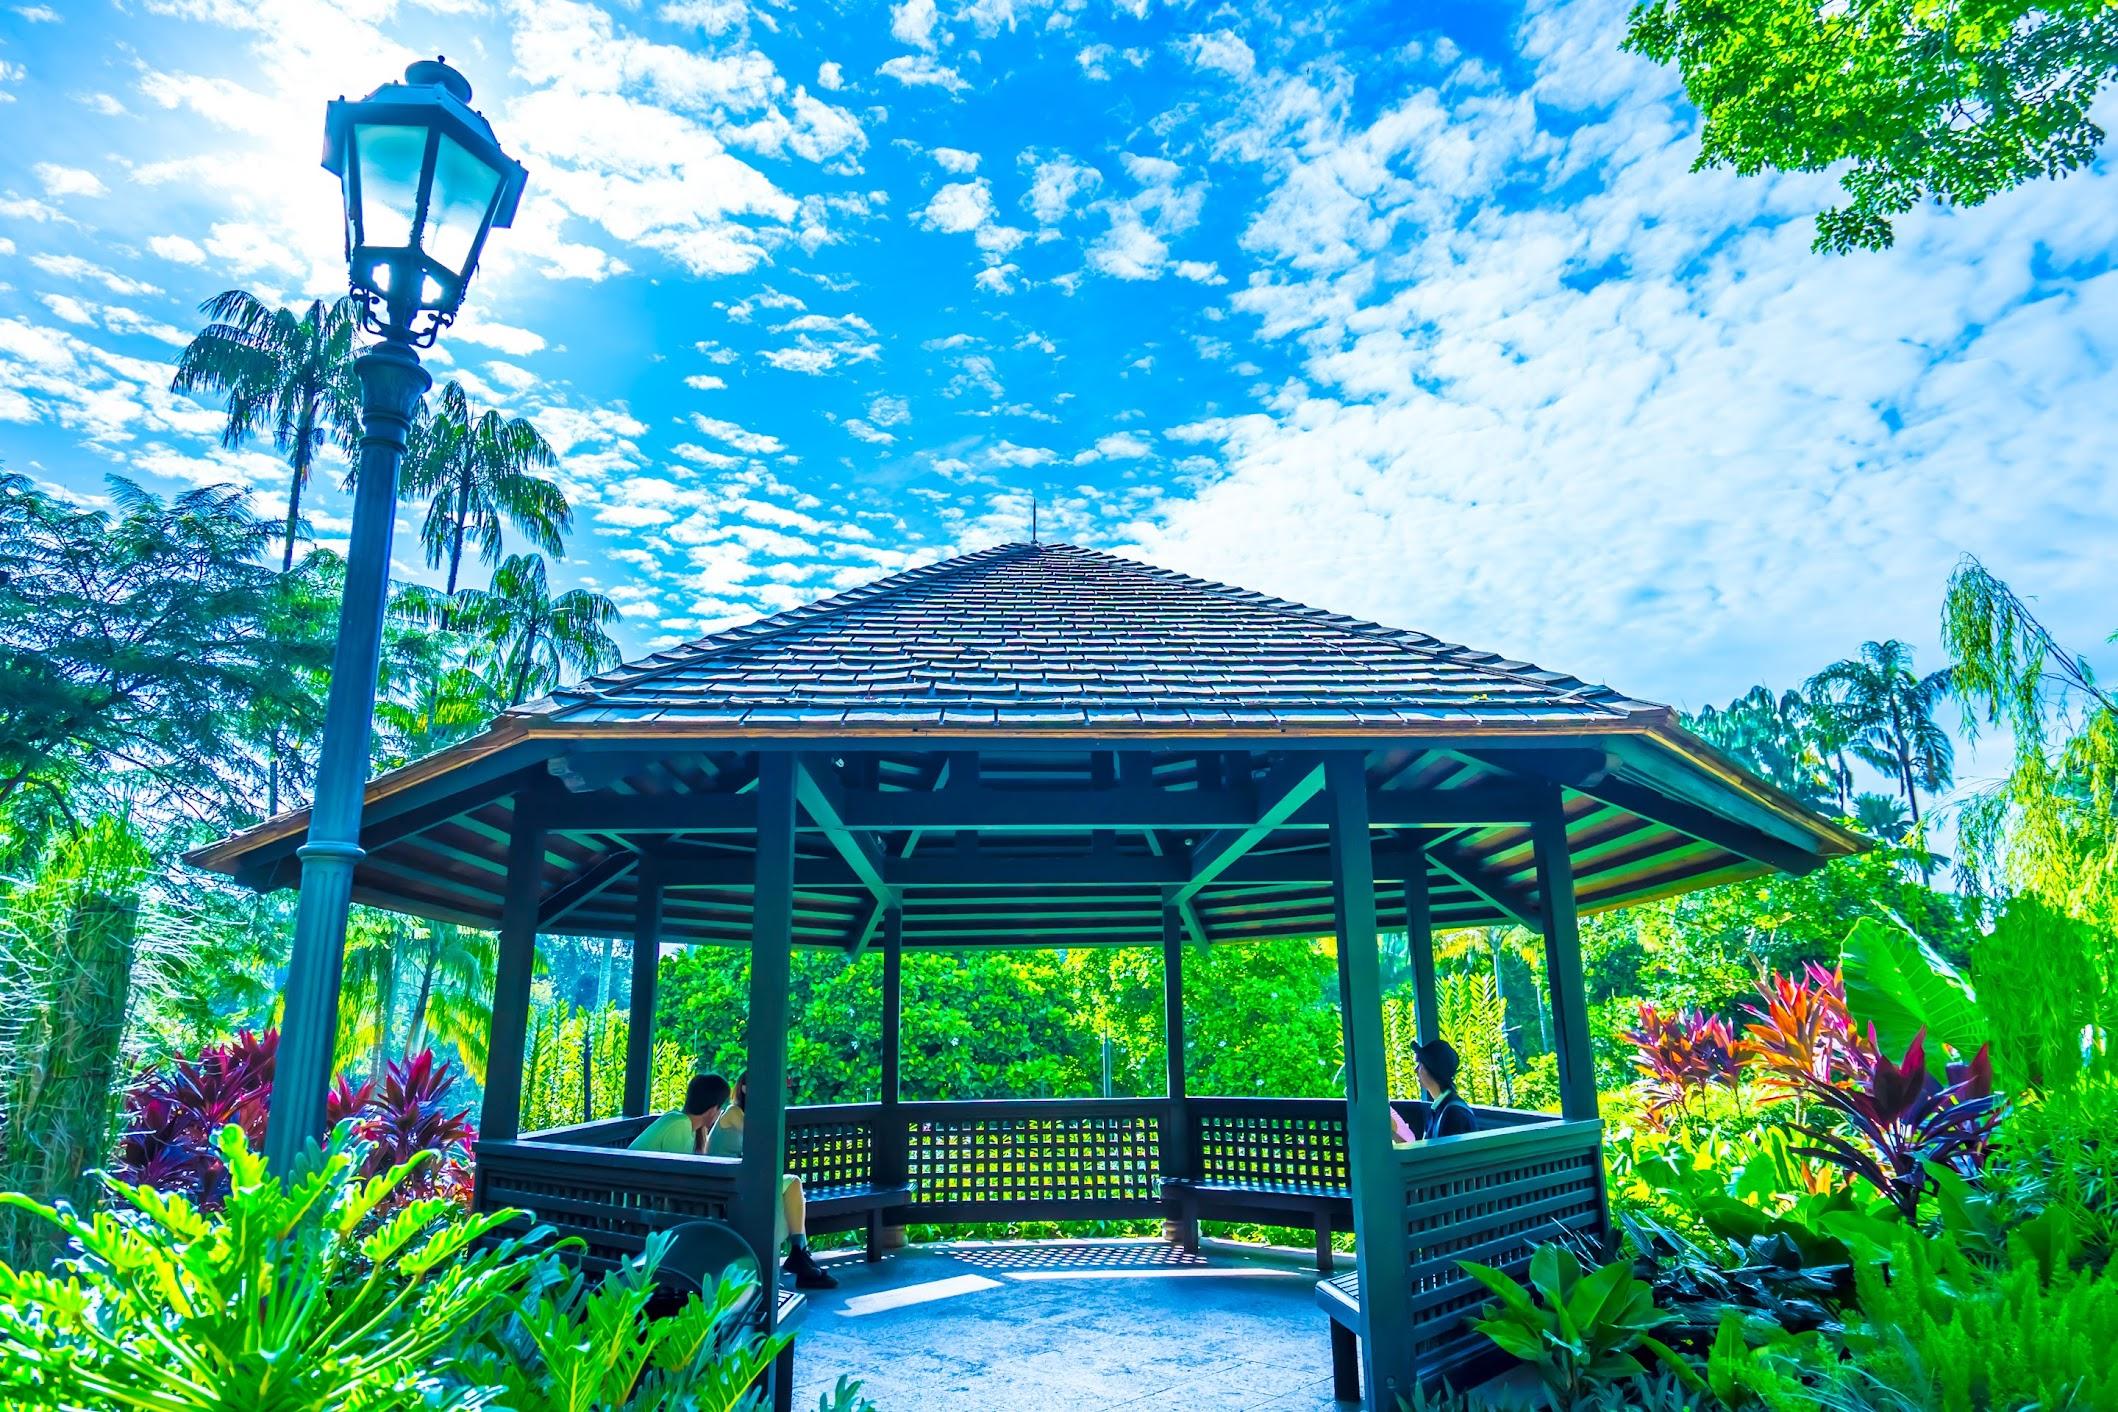 Singapore Botanic Gardens National Orchid Garden2